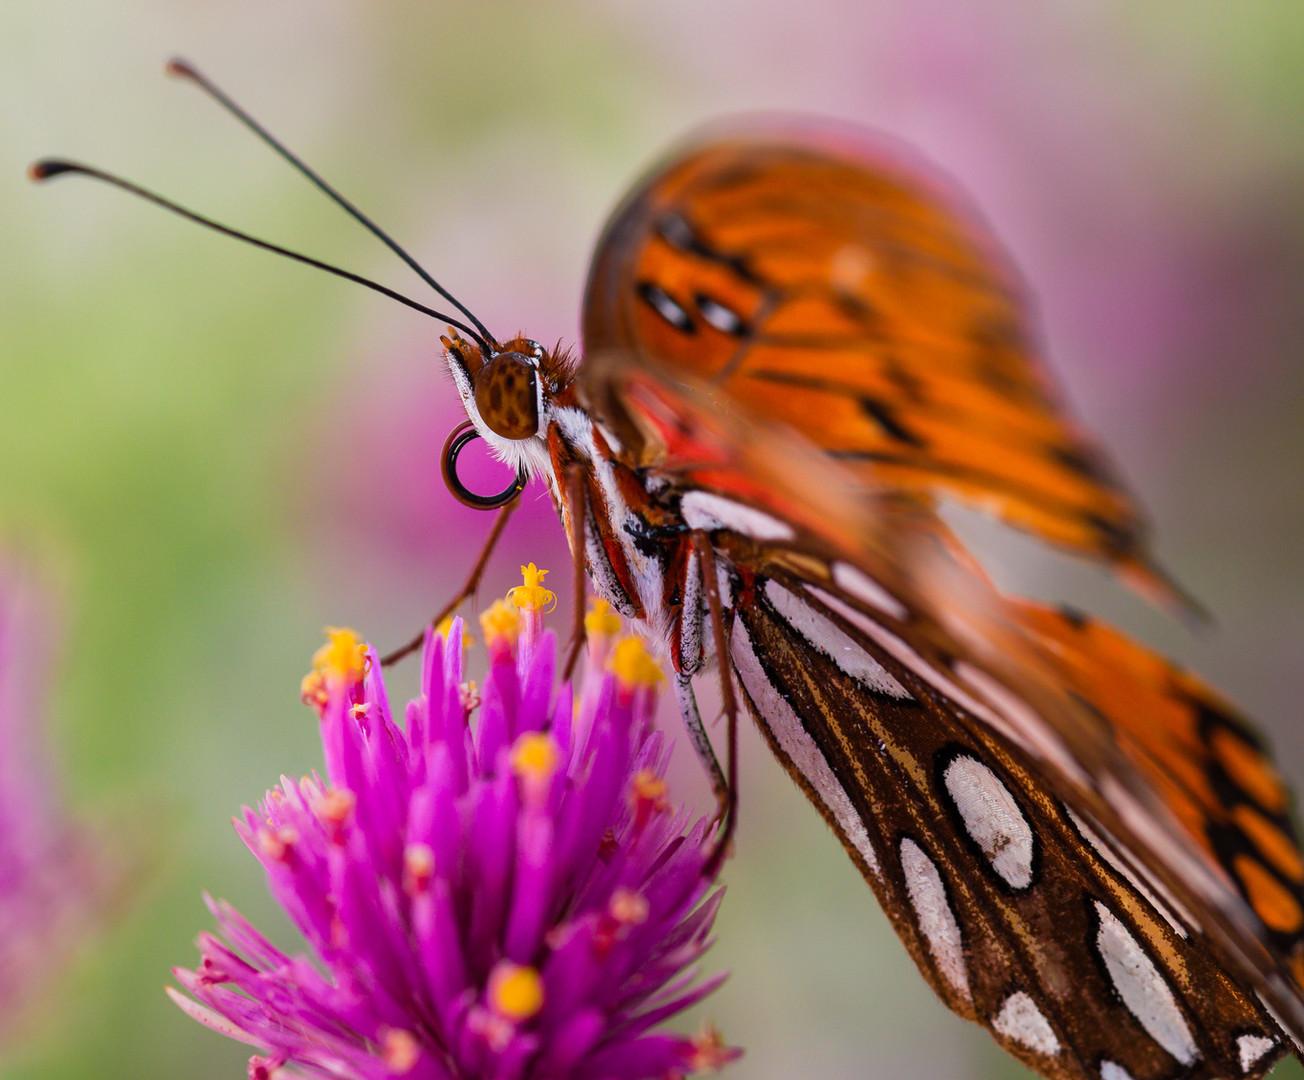 Pollinator at Work